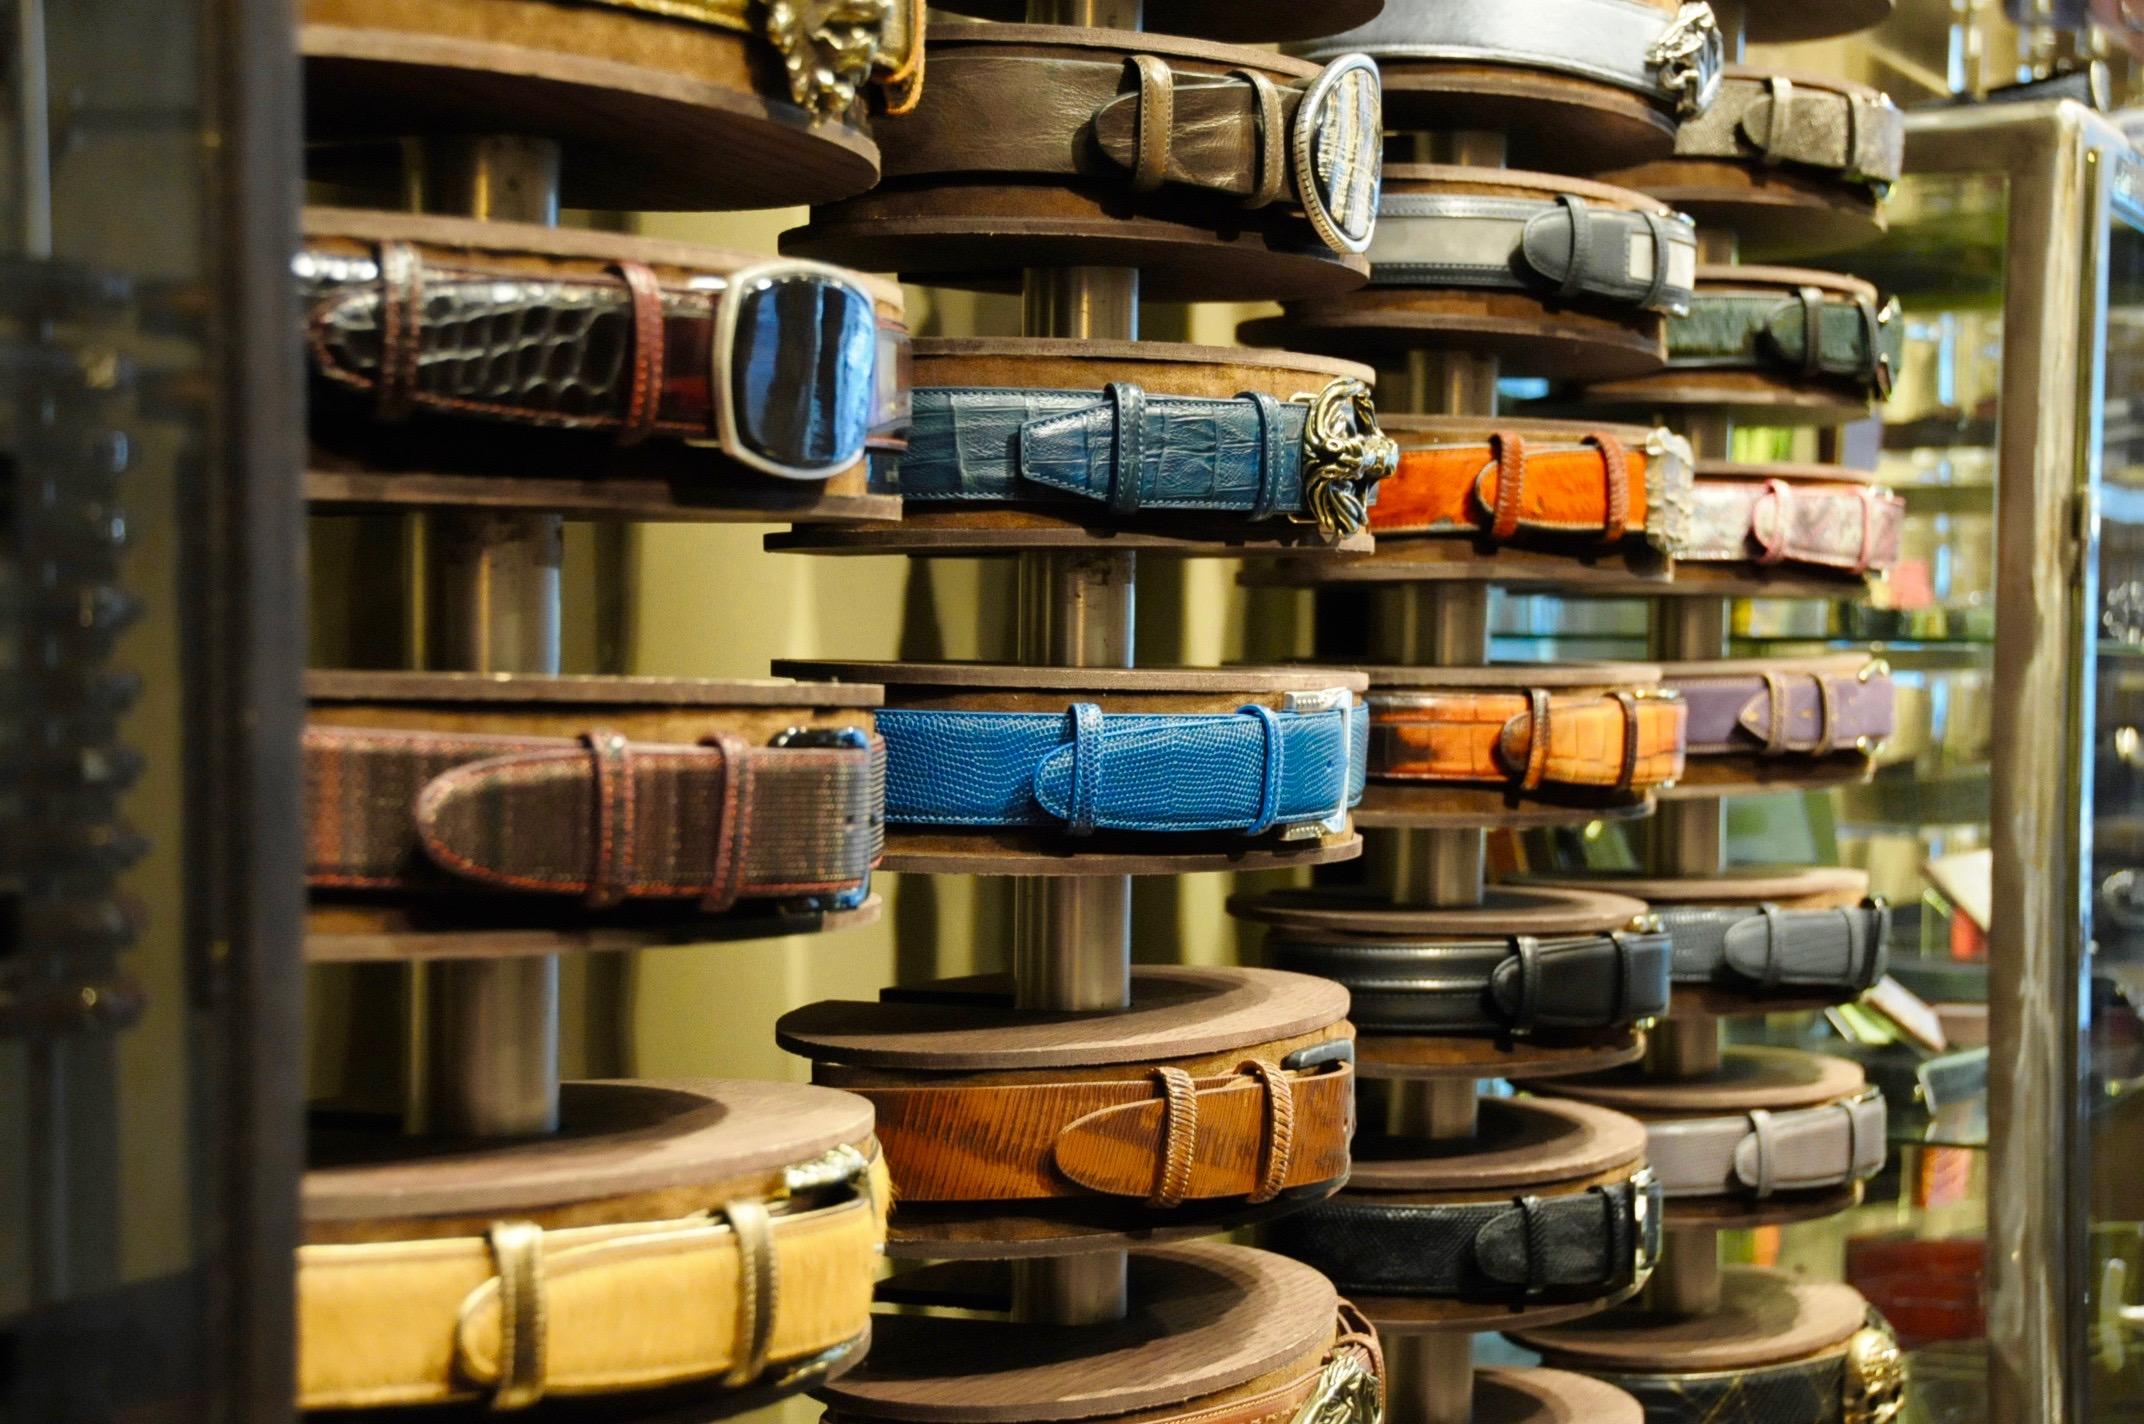 elliot rhodes belts interior shop display